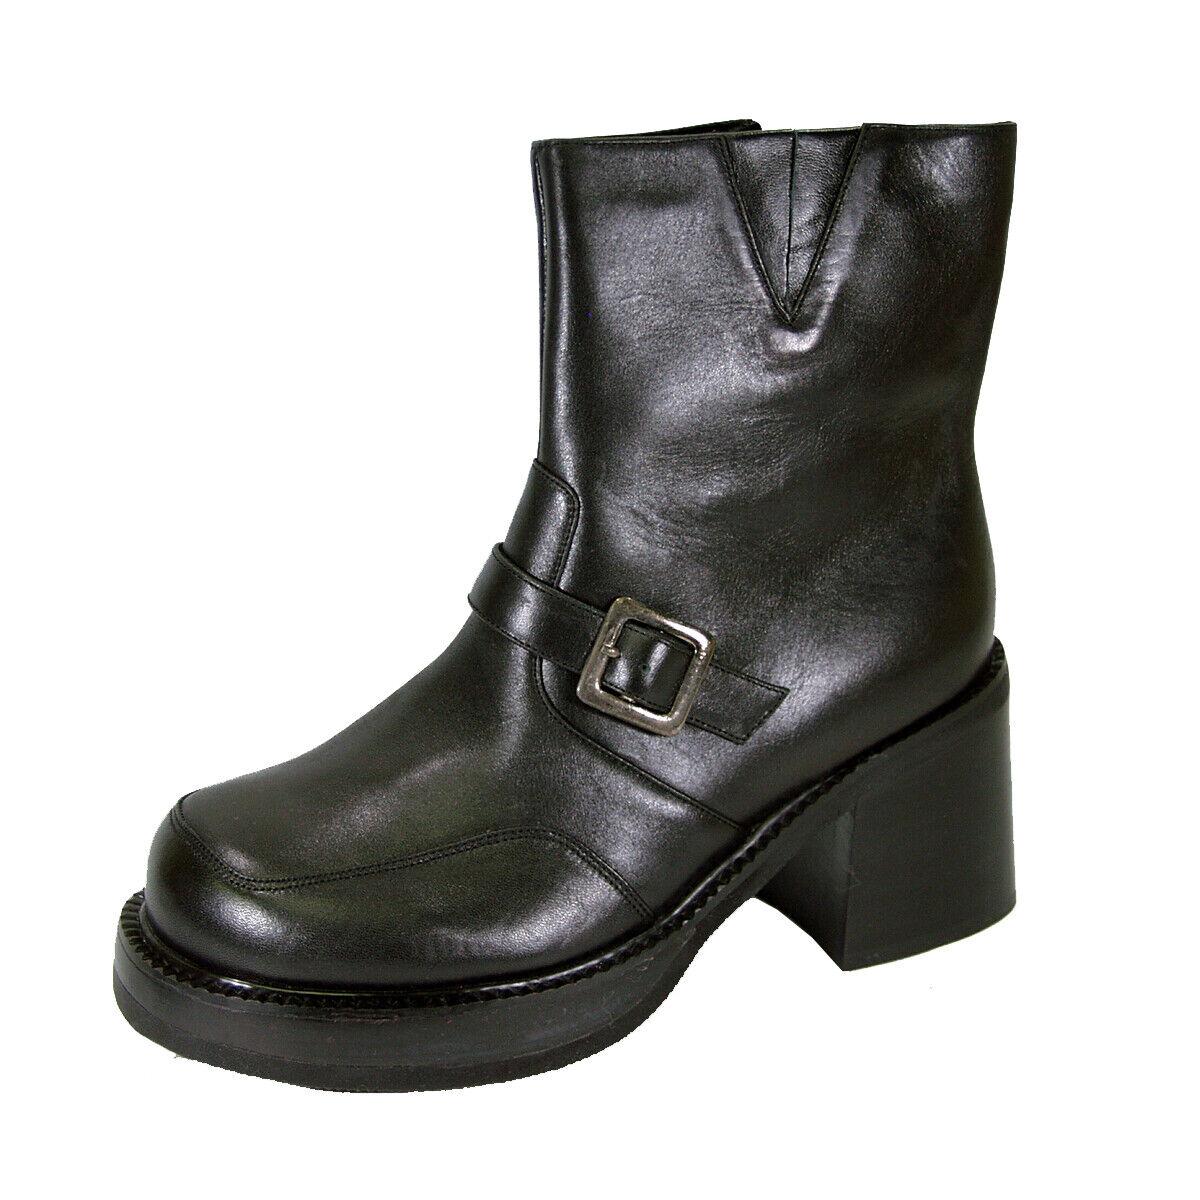 PEERAGE Hilda Women Wide Width Elegant Comfort Leather Dress Bootie Fall Winter